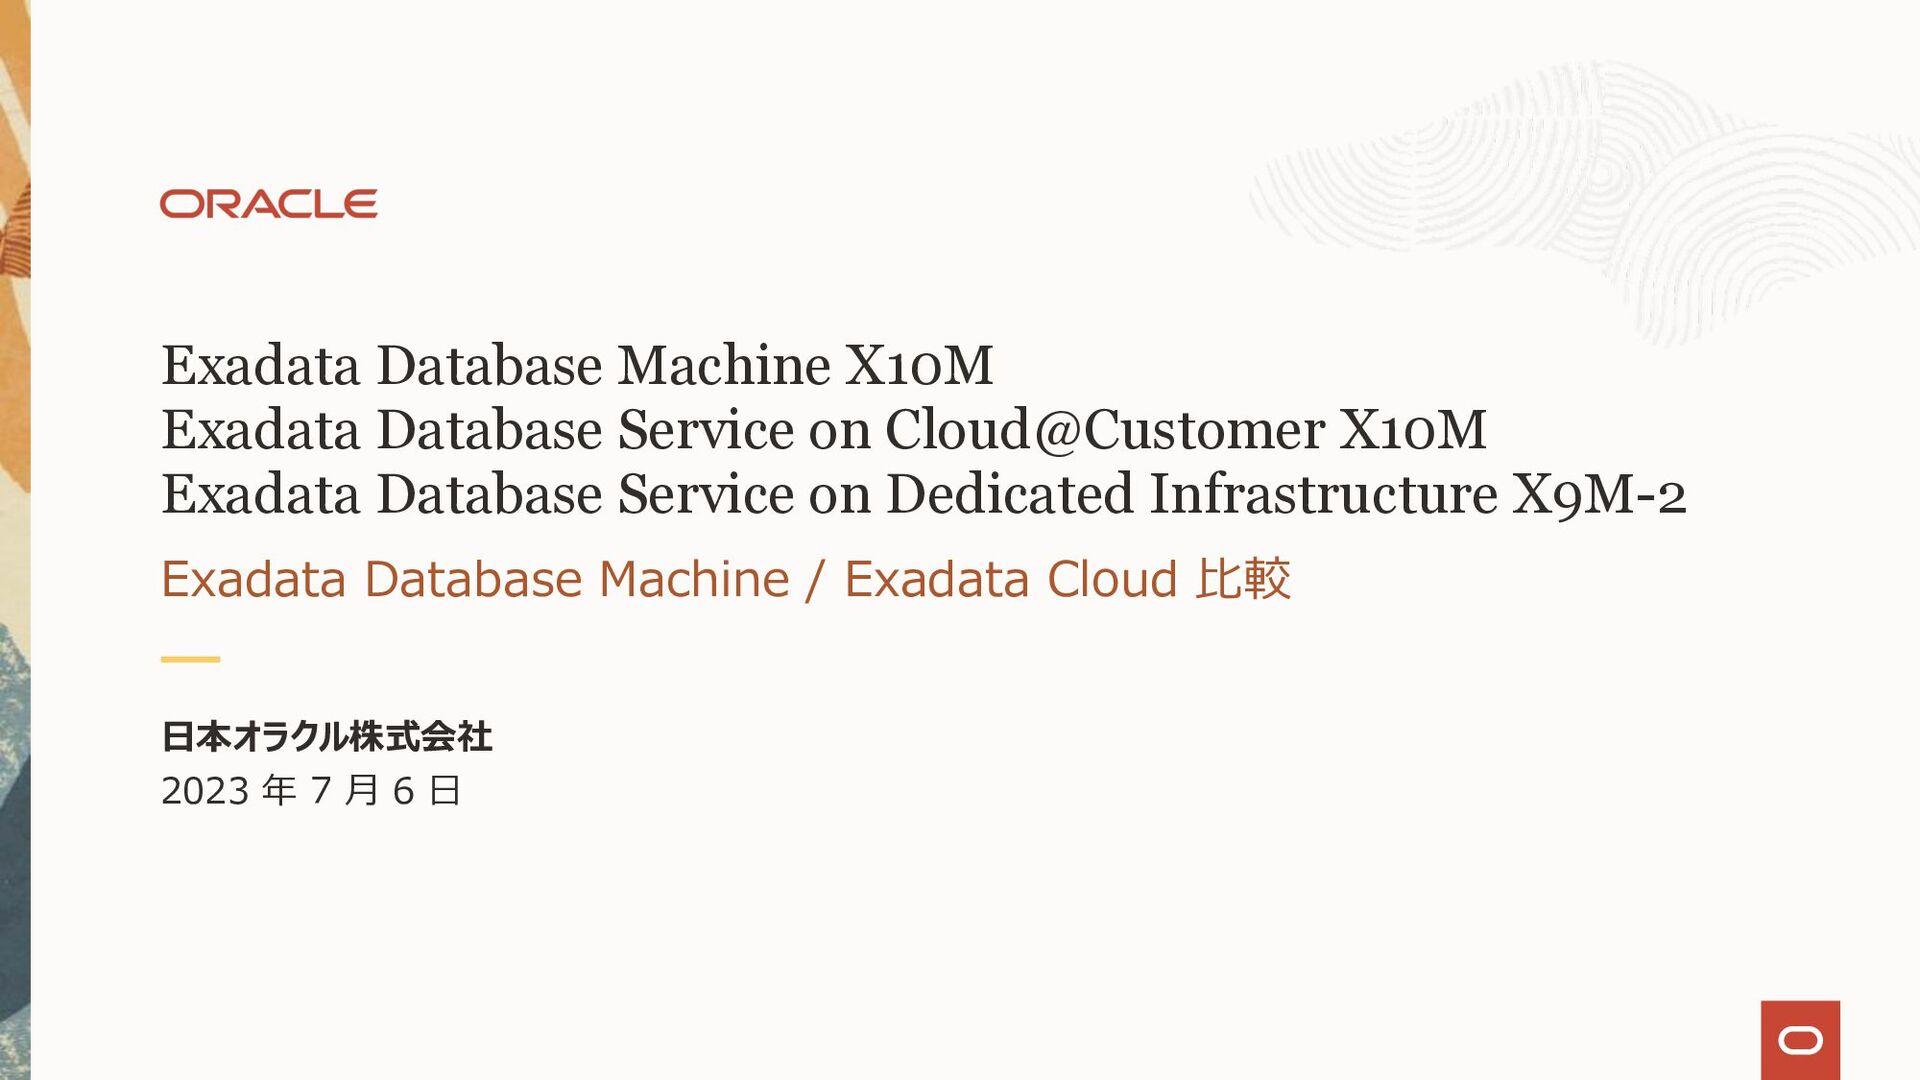 Oracle Exadata Cloud Service X8M Oracle Exadata...